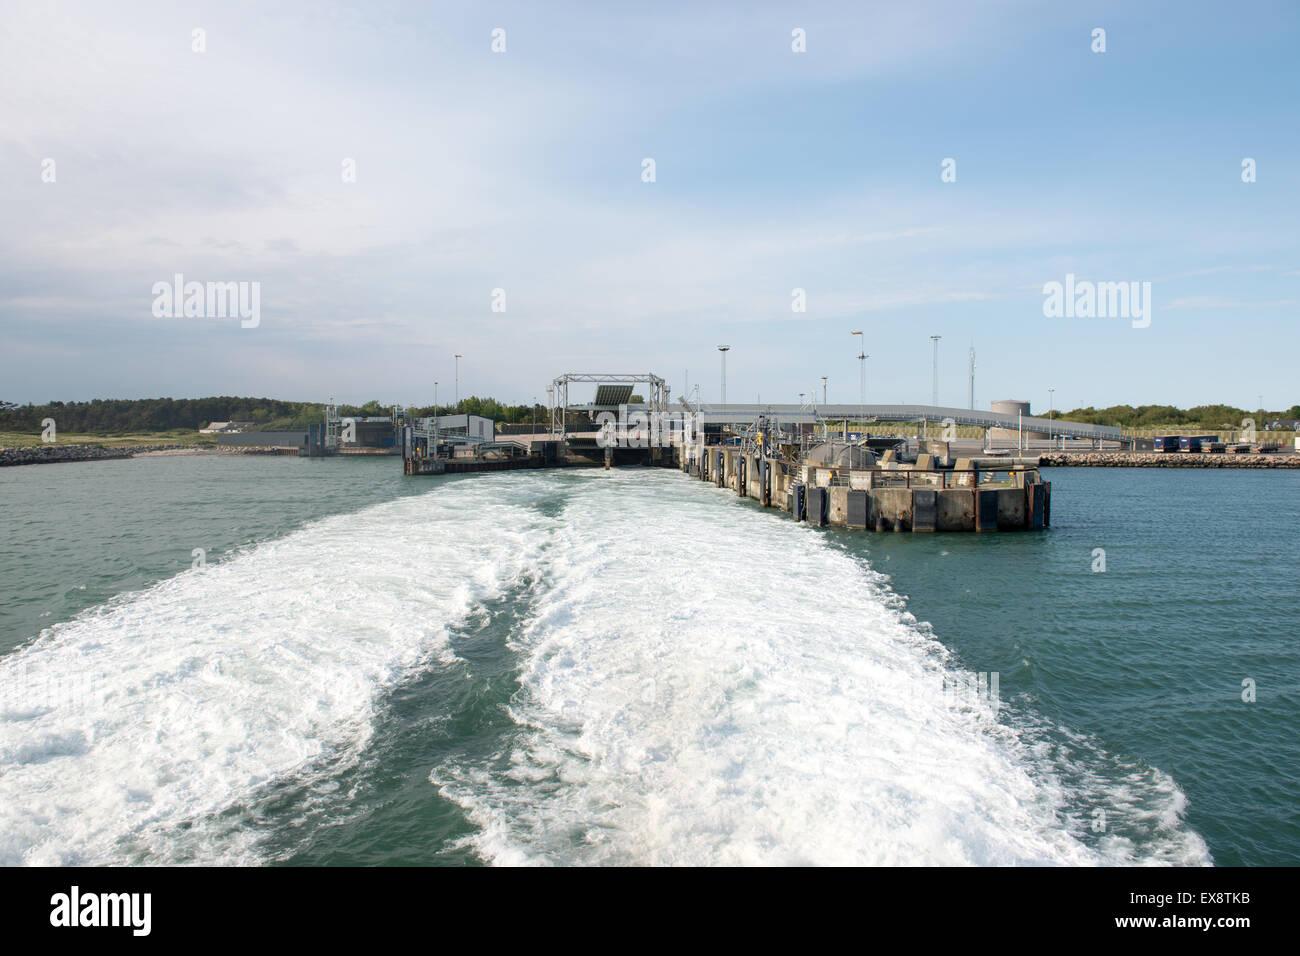 Sjællands odde ferry terminal as seen from the high speed ferry of mols linien, - Stock Image